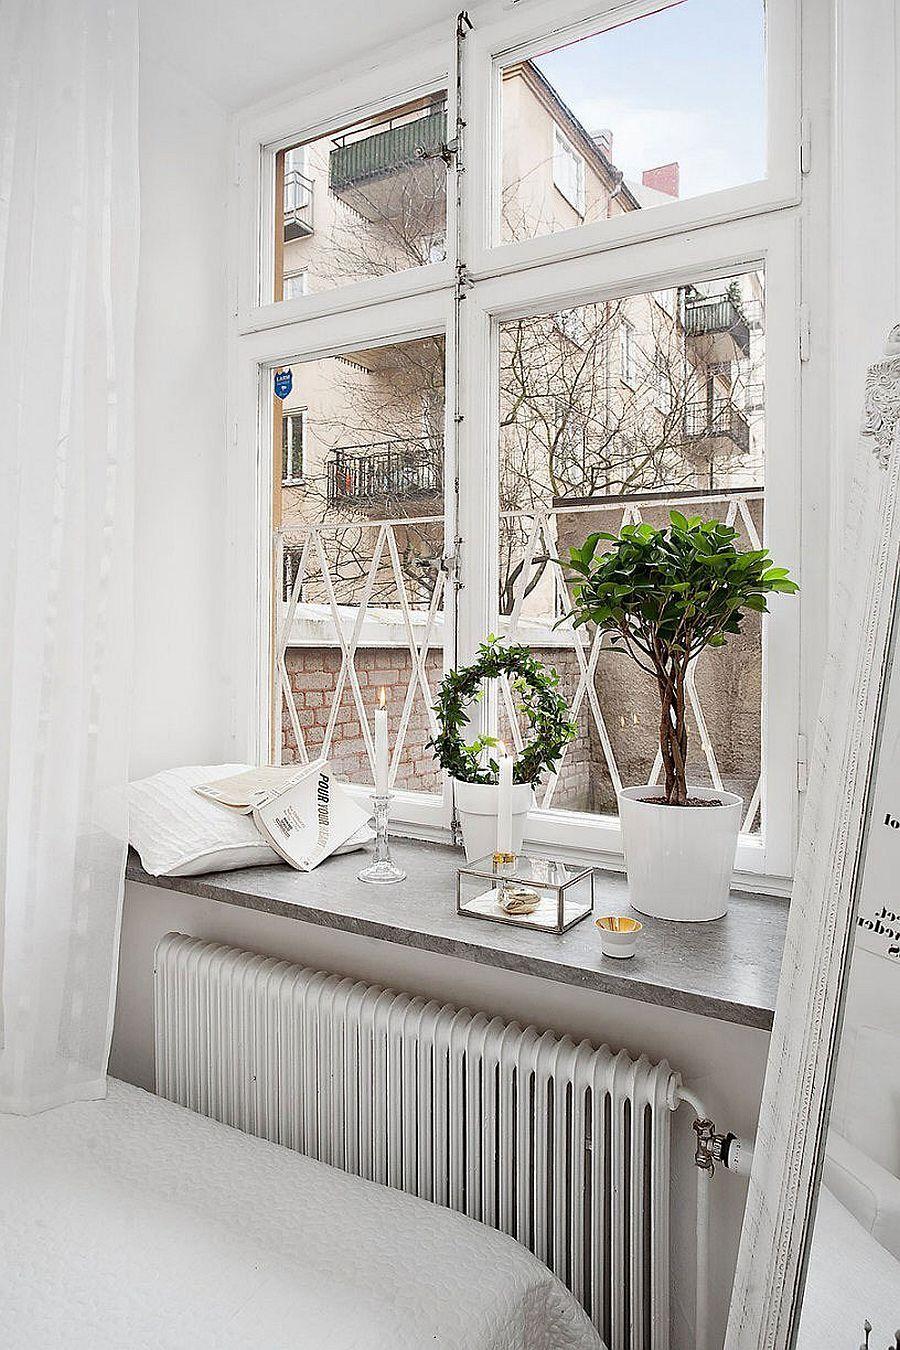 20 Sqm Apartment In Stockholm With Scandinavian Design Window Sill Decor Interior Windows Bedroom Decor